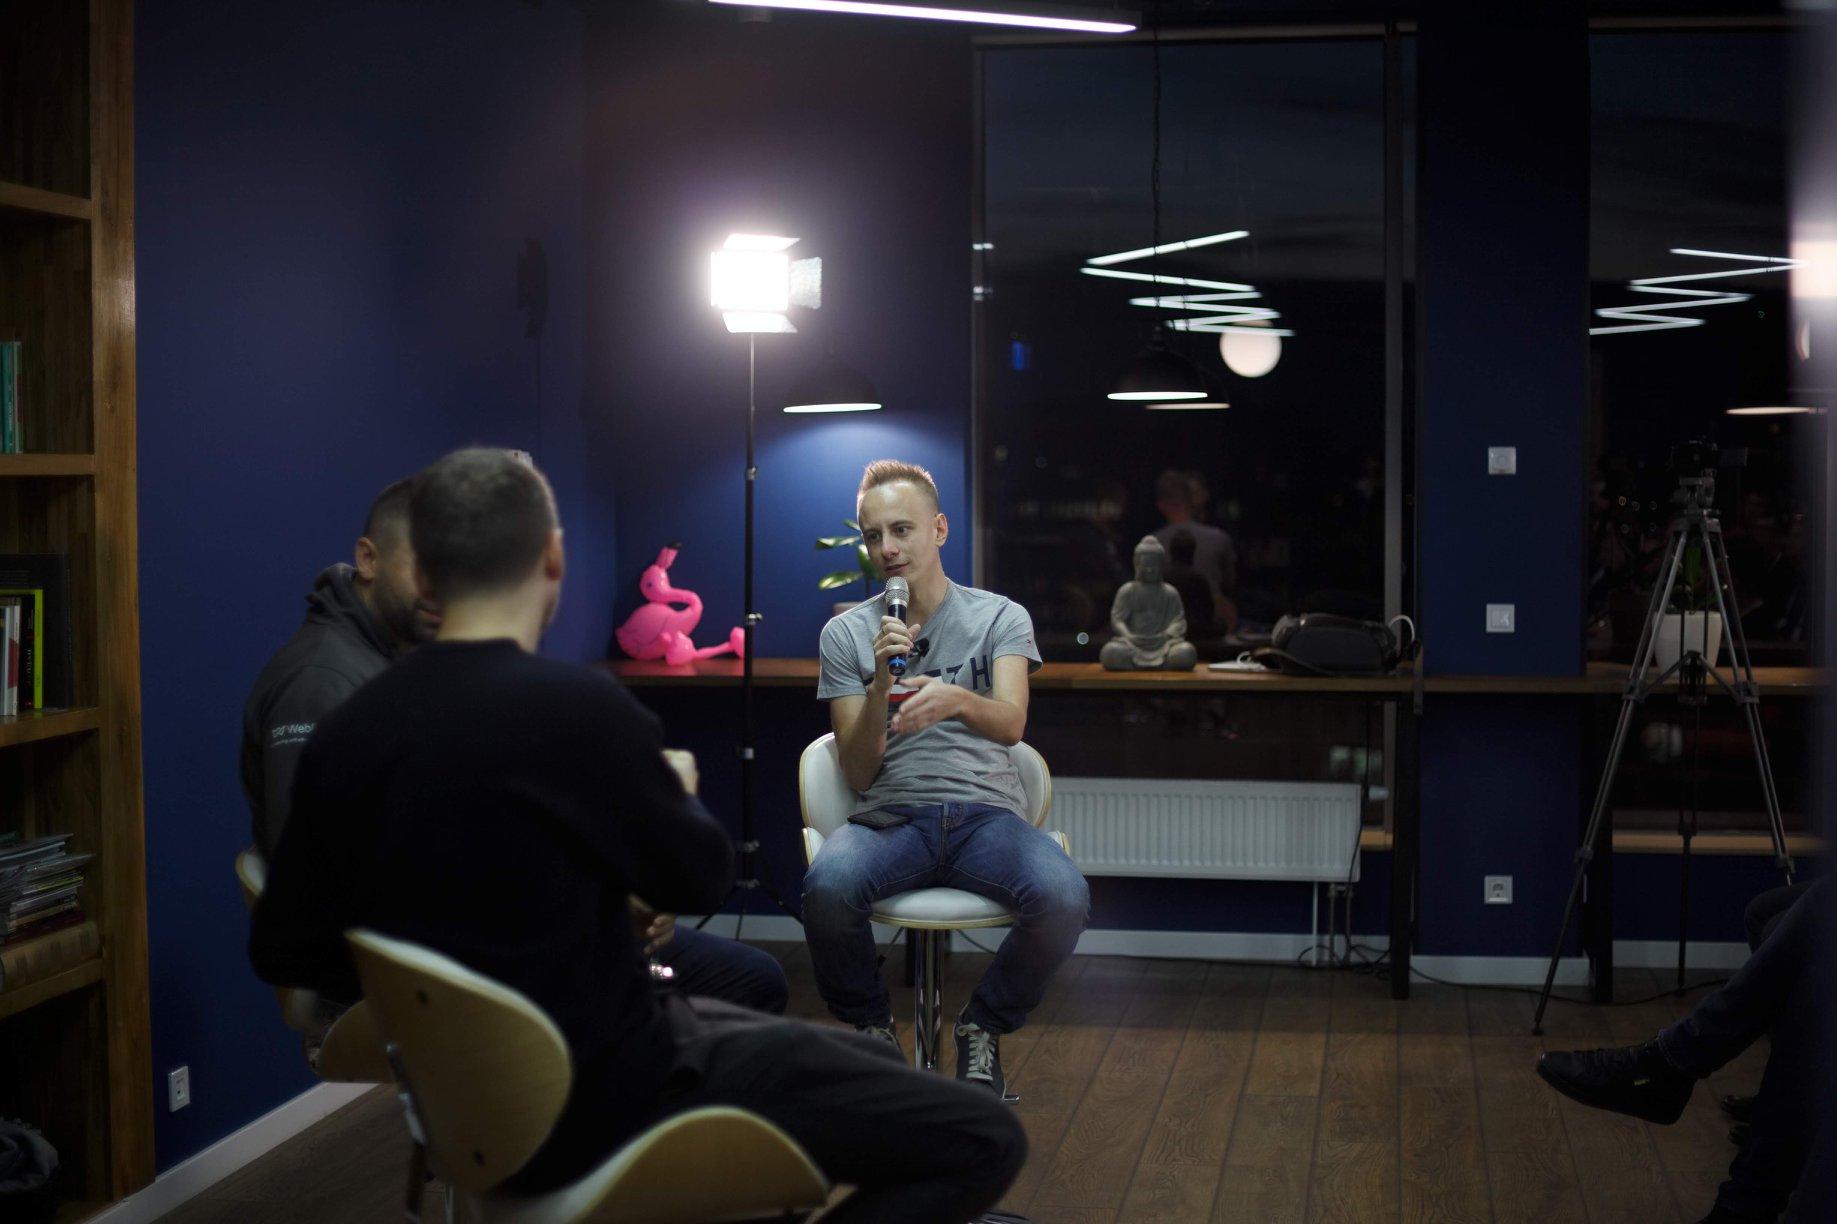 Вечеринка YouTube-канала «Точка G» в Киеве